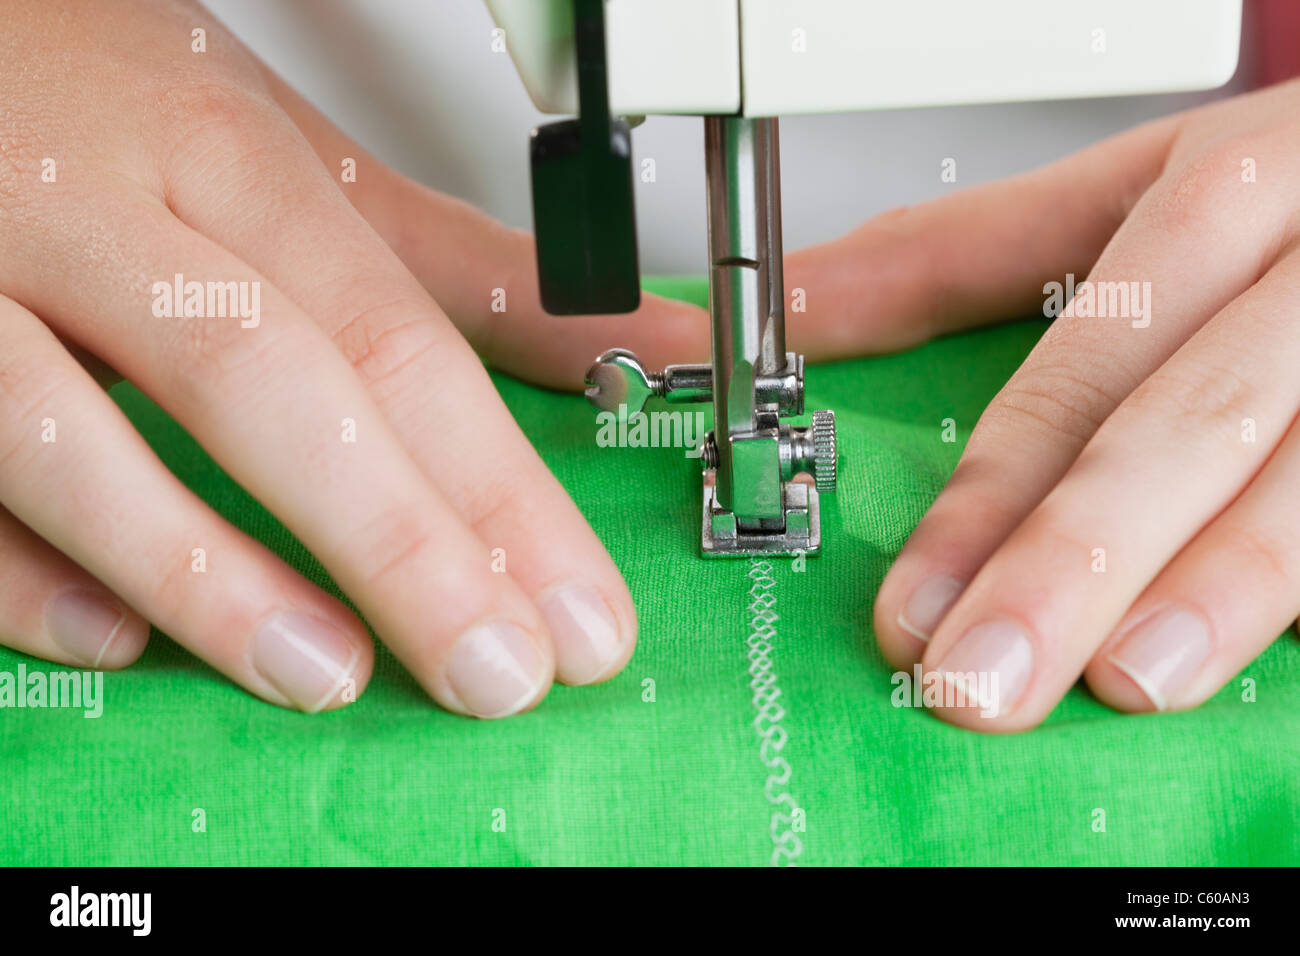 USA, Illinois, Metamora, close-up of woman sewing - Stock Image